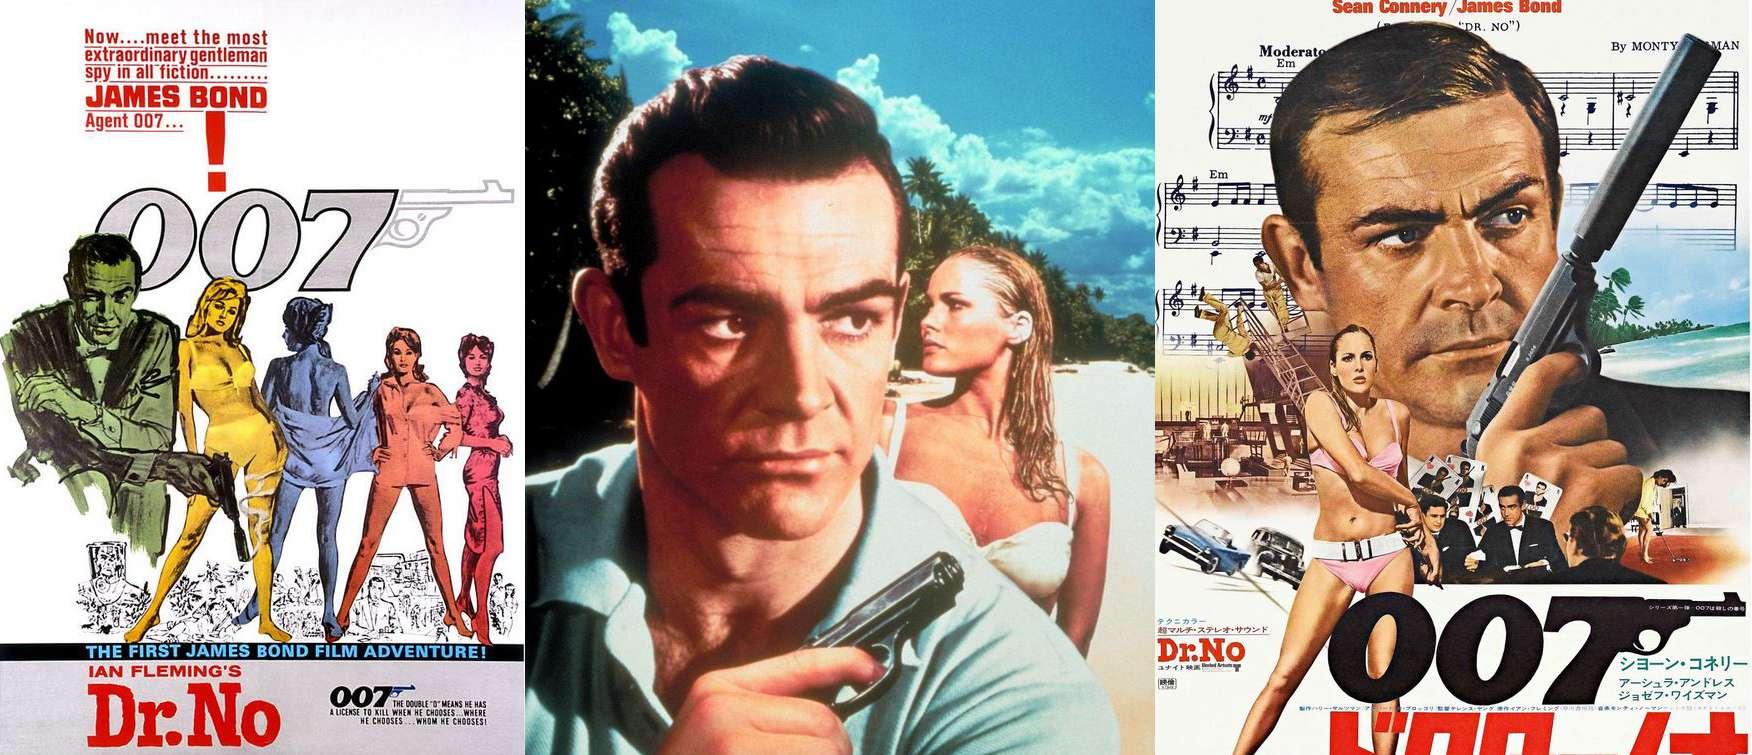 Sean Connery Σον Κόνερι Ursula Andress Ούρσουλα Άντρες 007 Bond Doctor NO